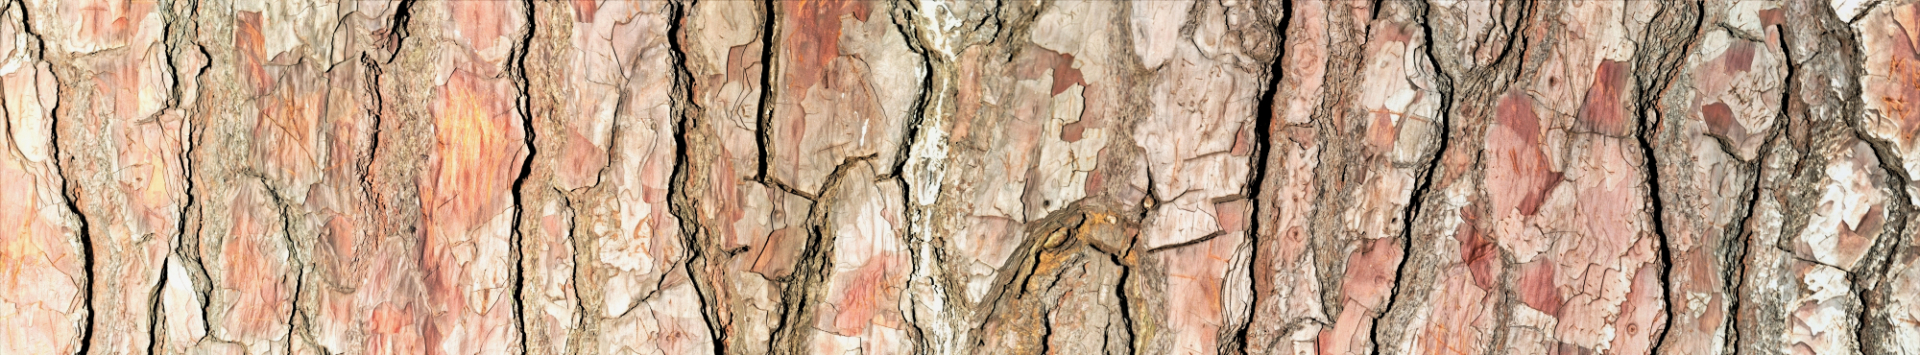 Pinus Tree Sydney